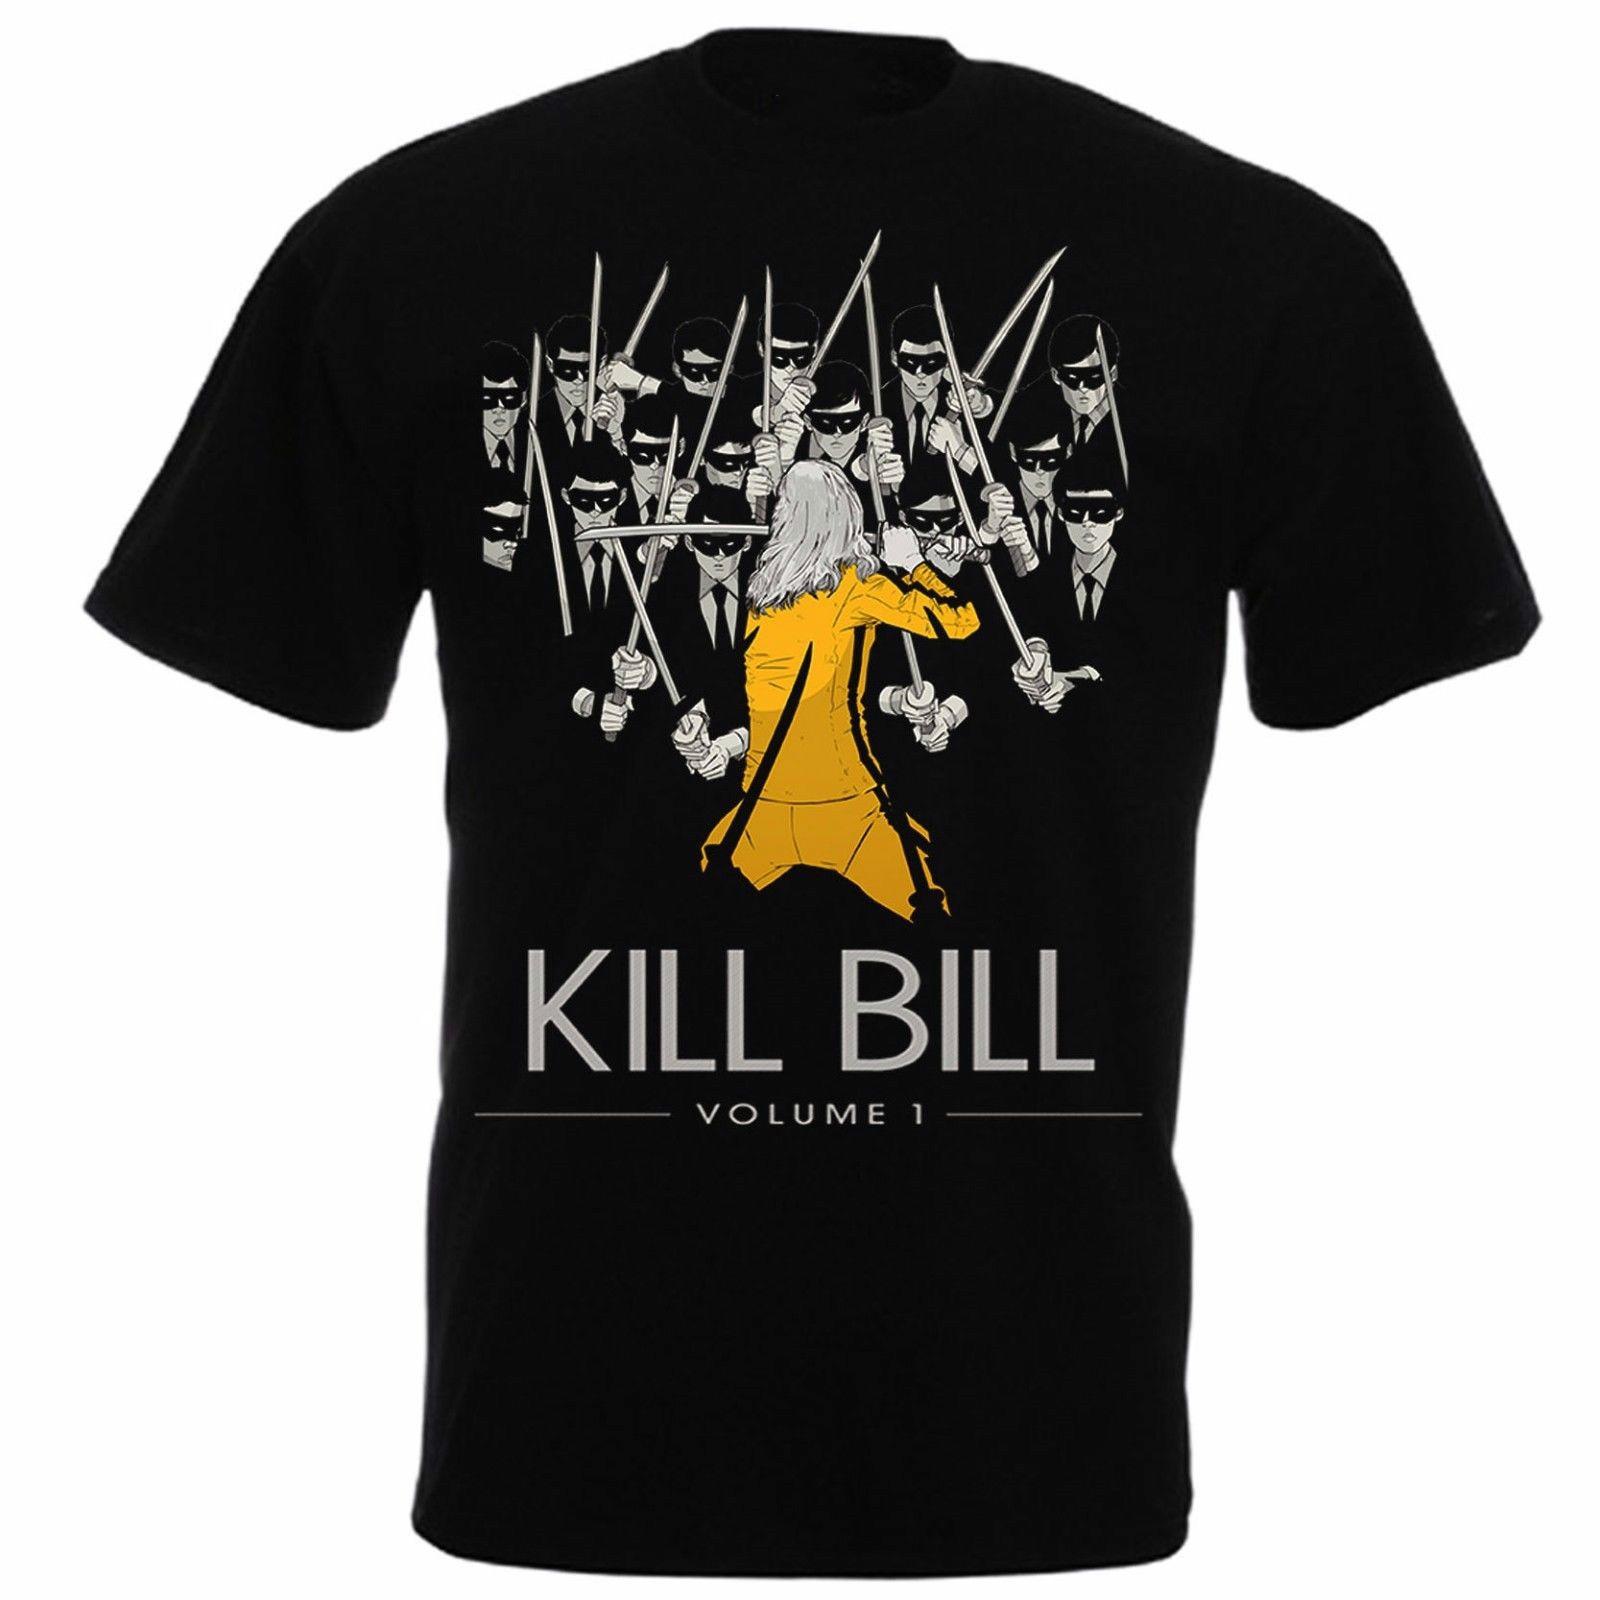 kill-bill-vol-1-by-quentin-font-b-tarantino-b-font-uma-thurman-as-black-mamba-movie-t-shirt-youth-round-collar-customized-t-shirts-top-tee